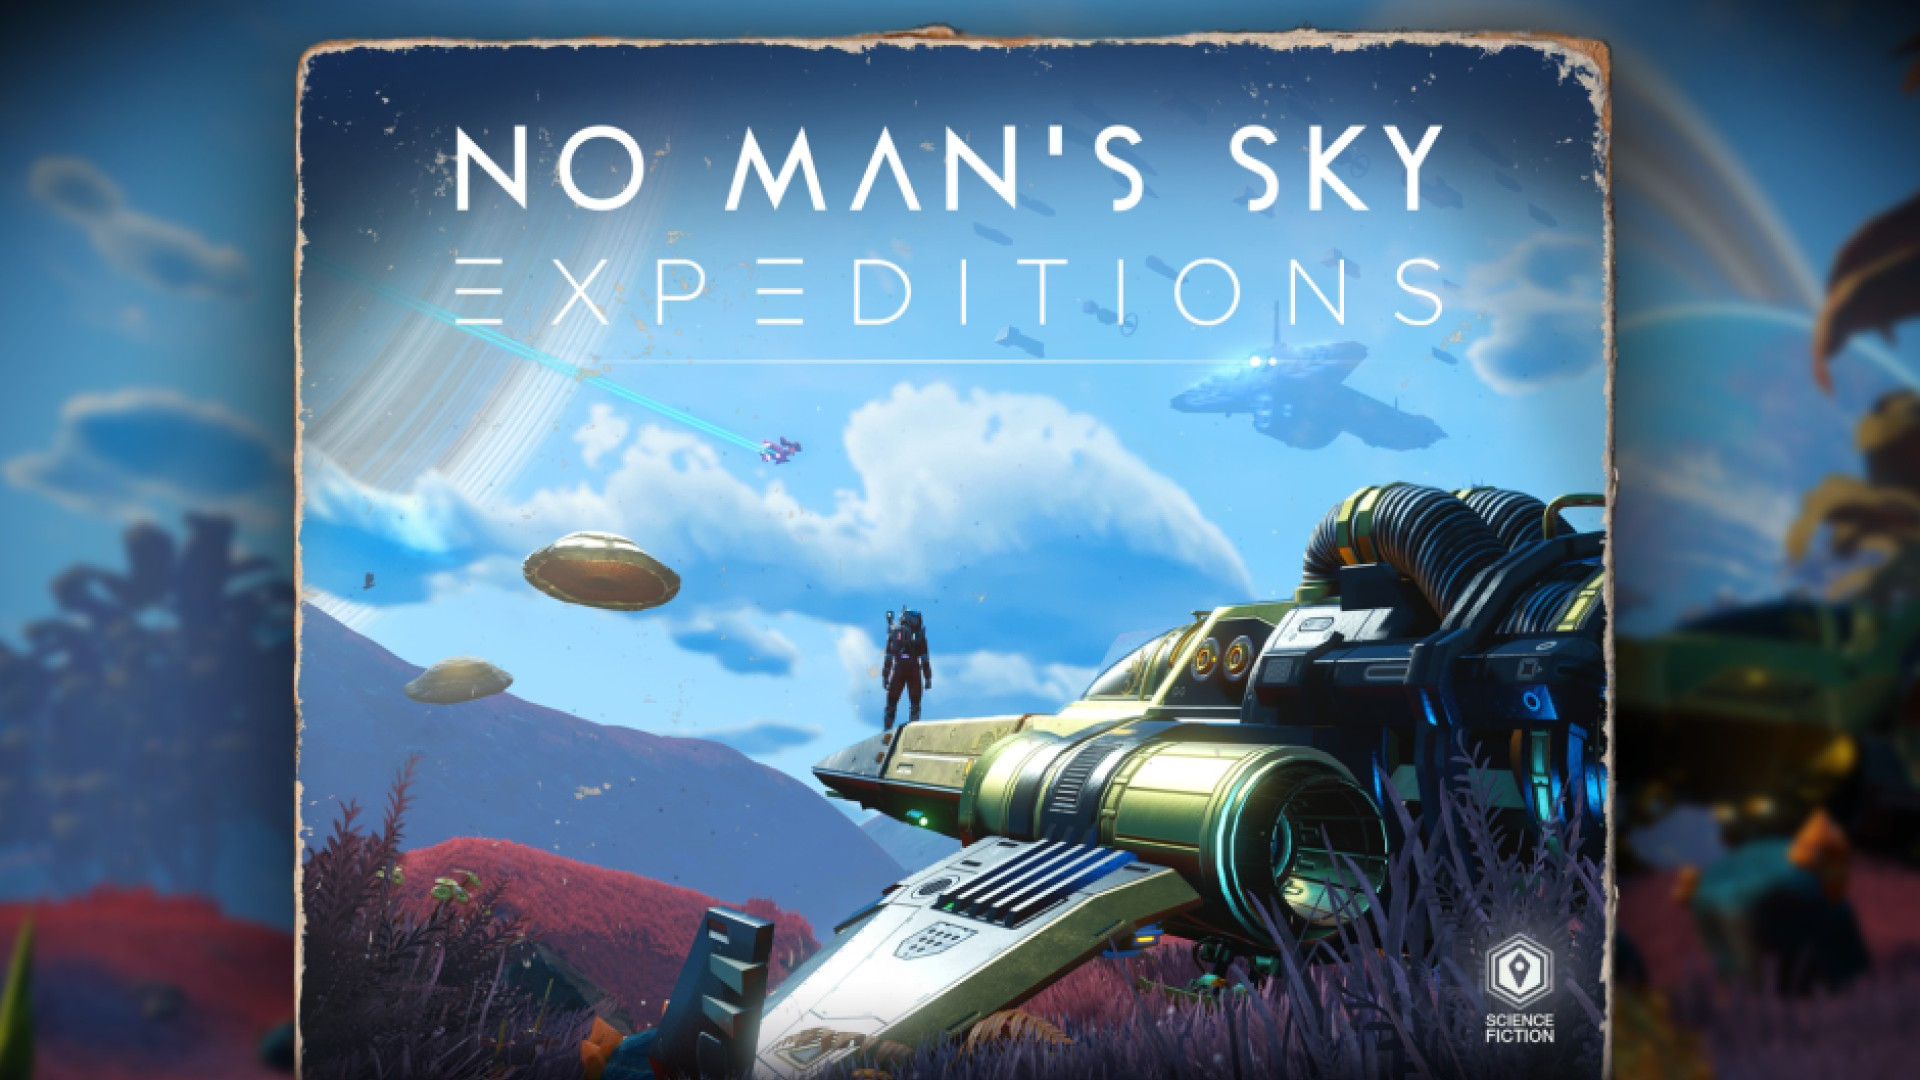 No Man's Sky: Expeditions